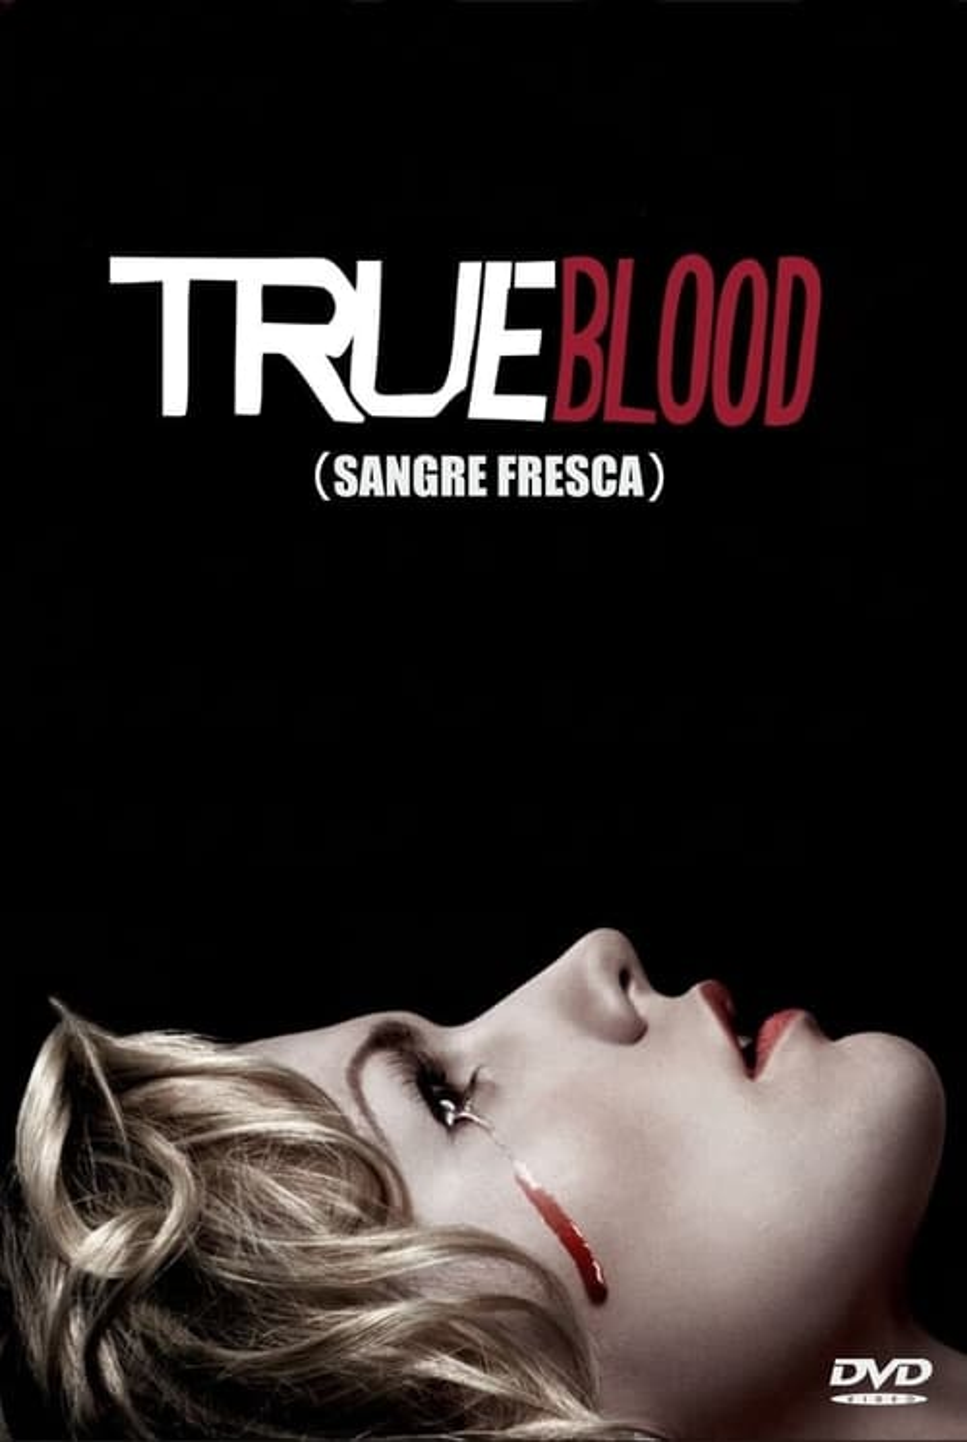 True Blood (Sangre Fresca) poster